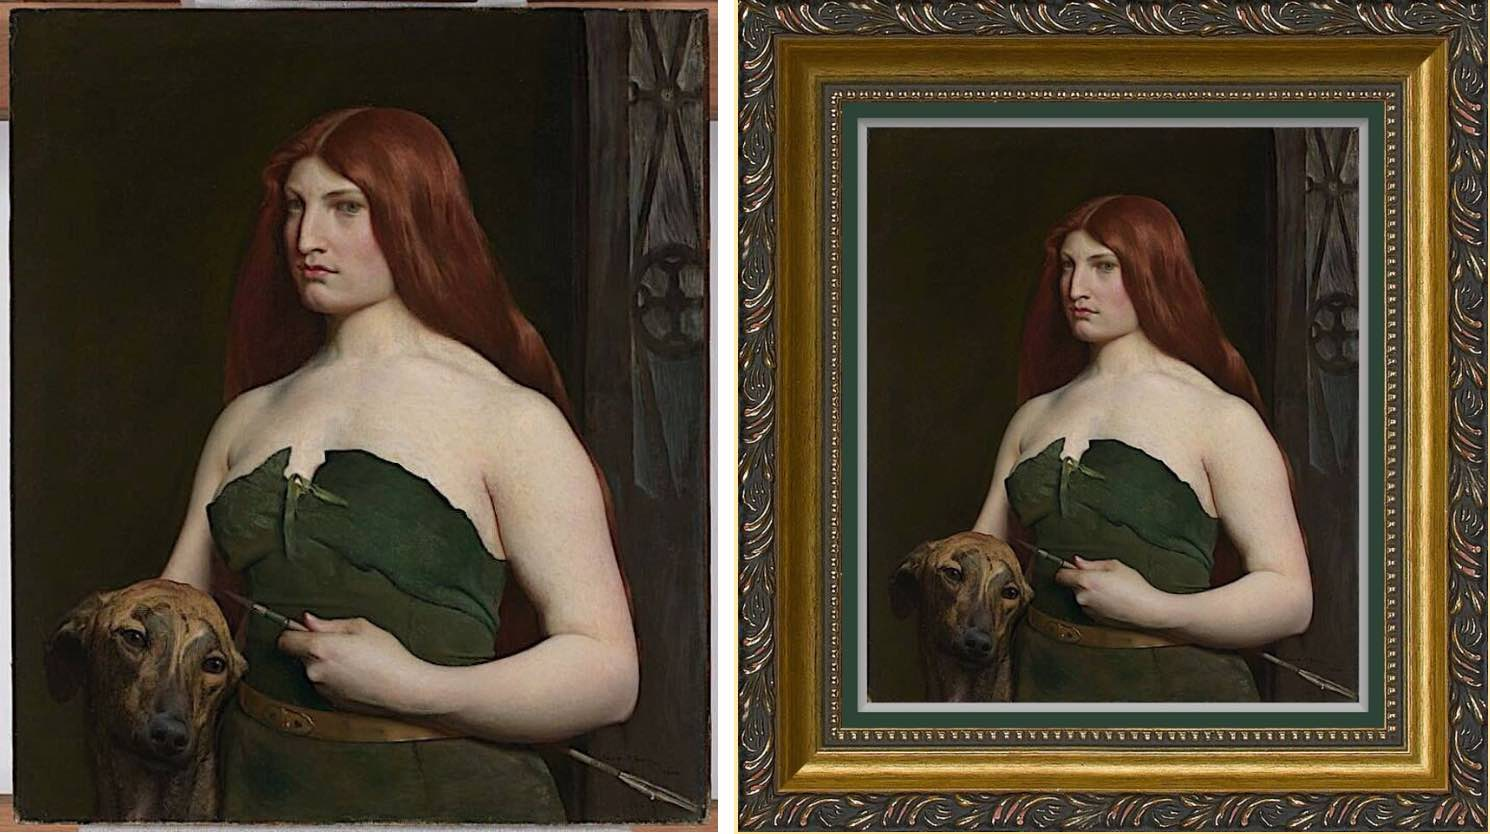 Virtual Museum of the Renaissance and Baroque Era